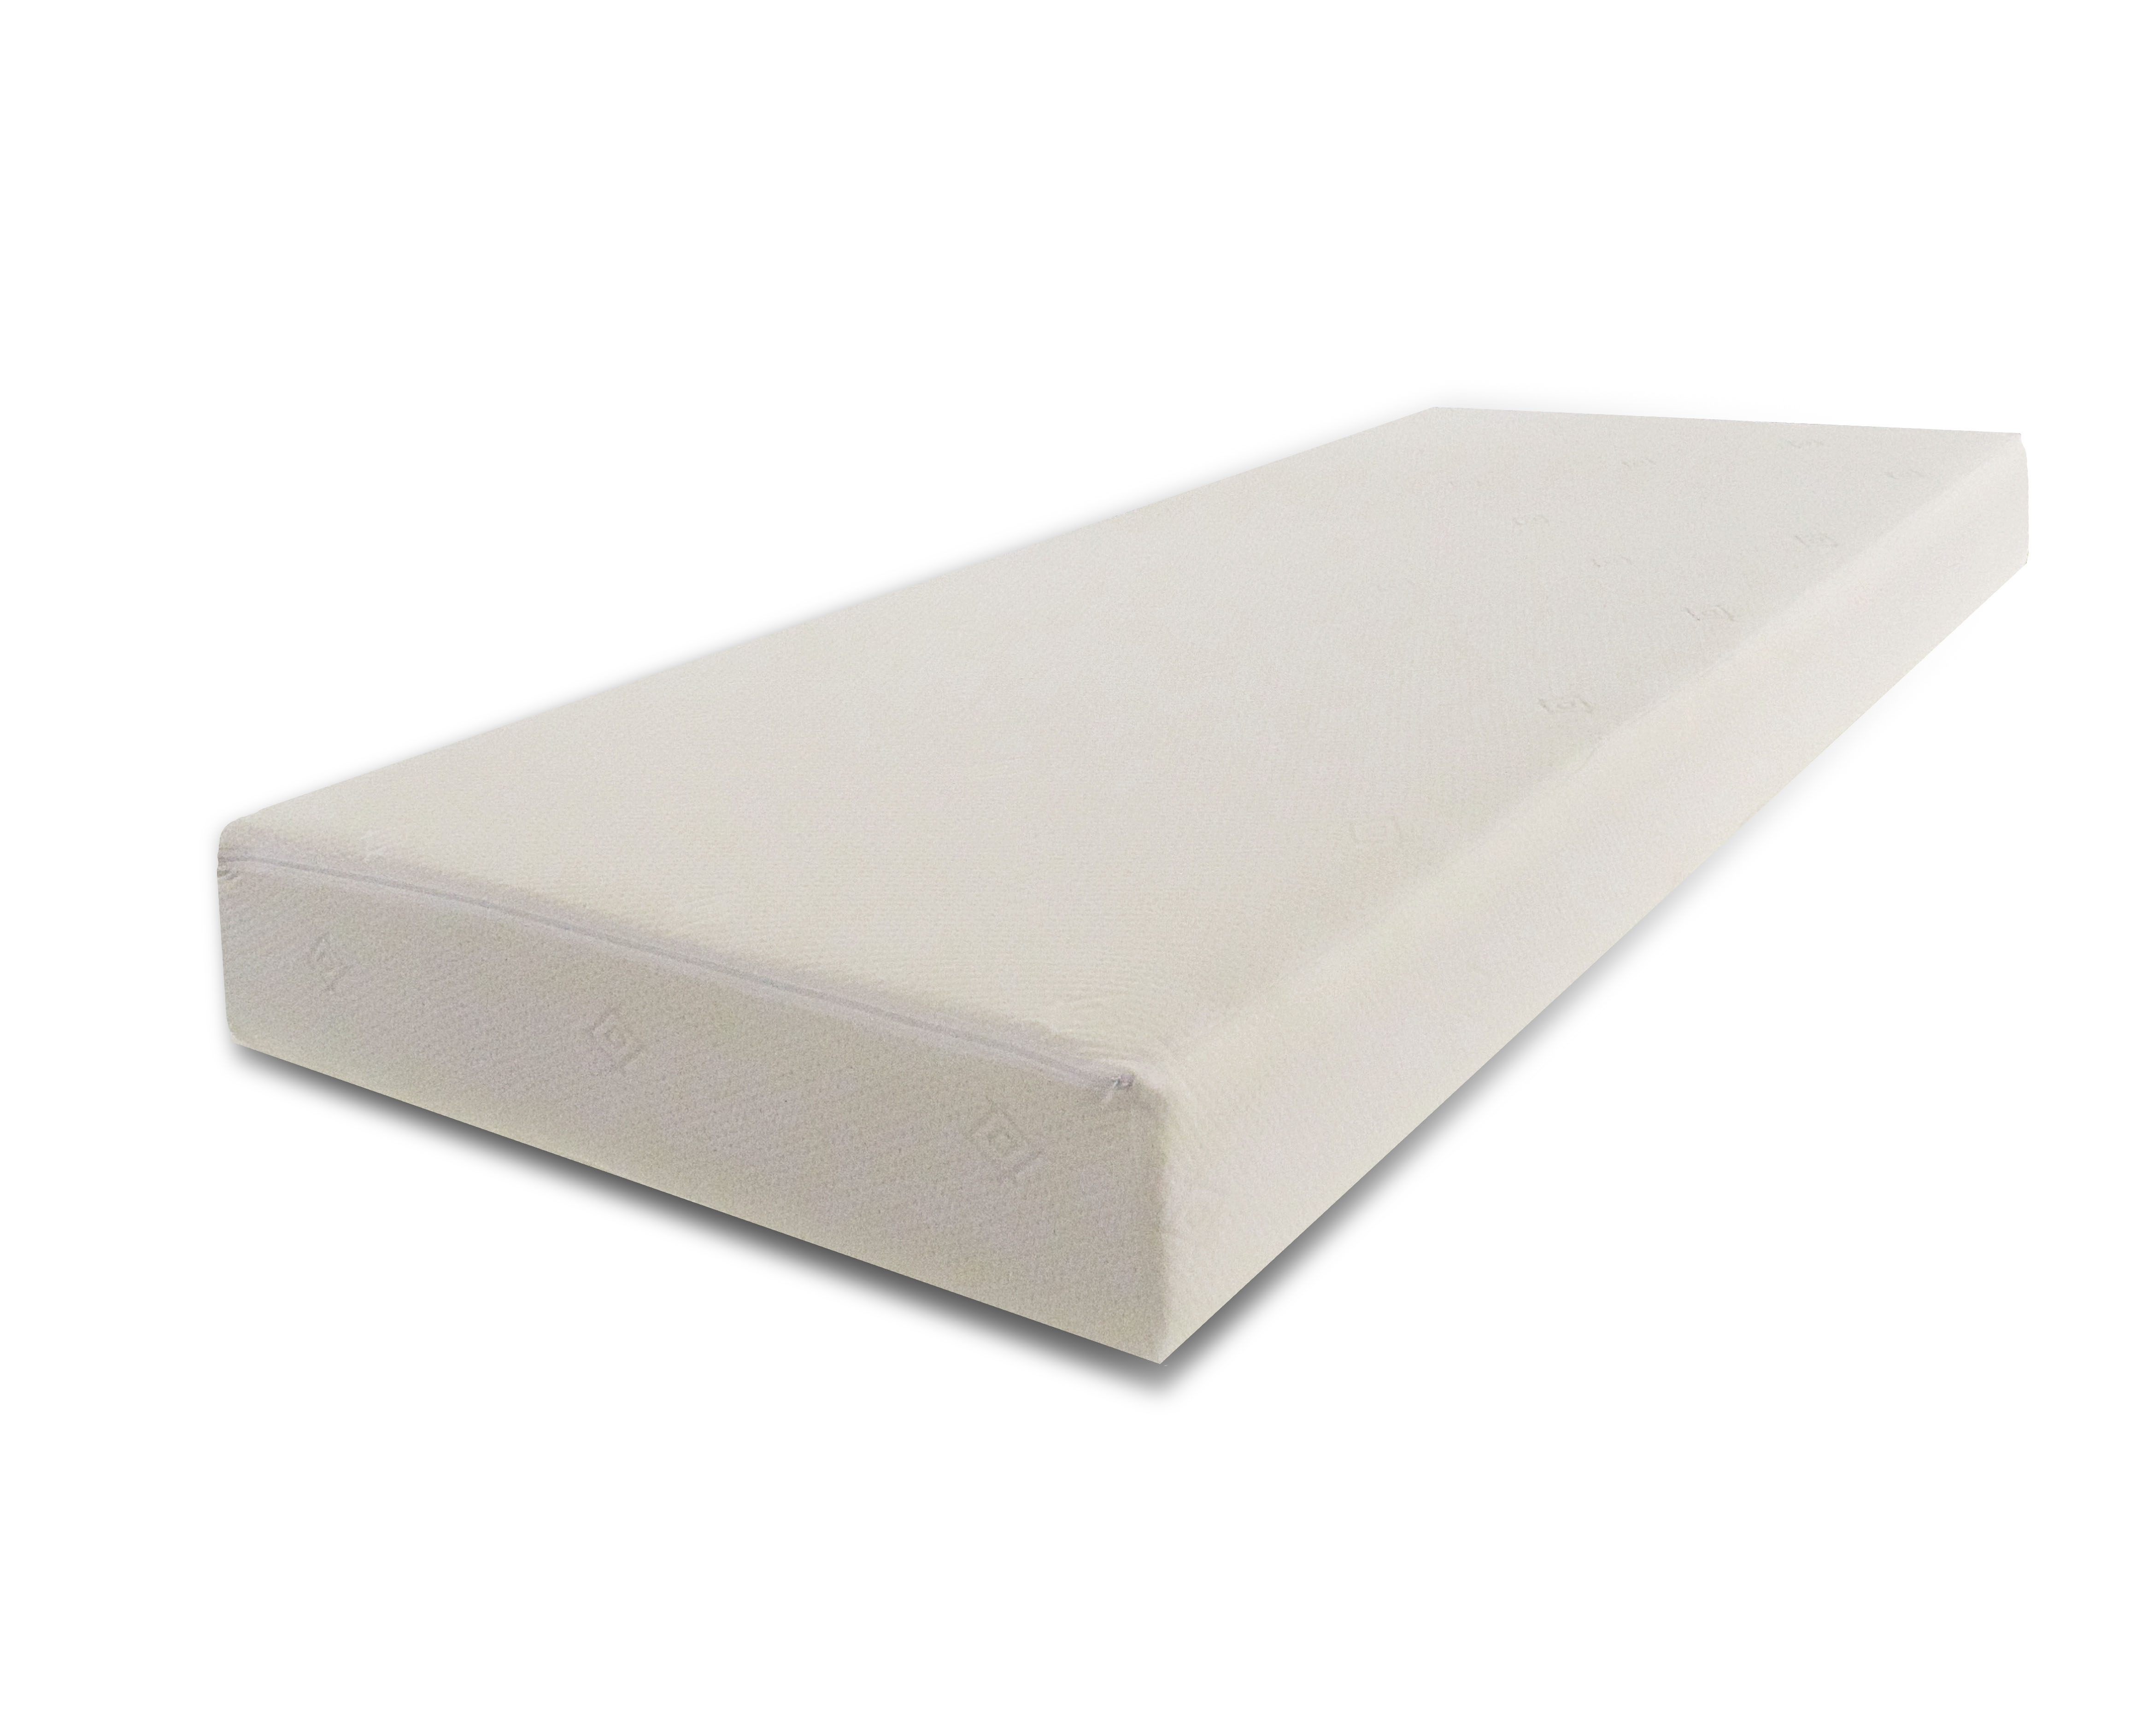 Uk Single Orthopaedic Memory Foam Mattress Carousel Care